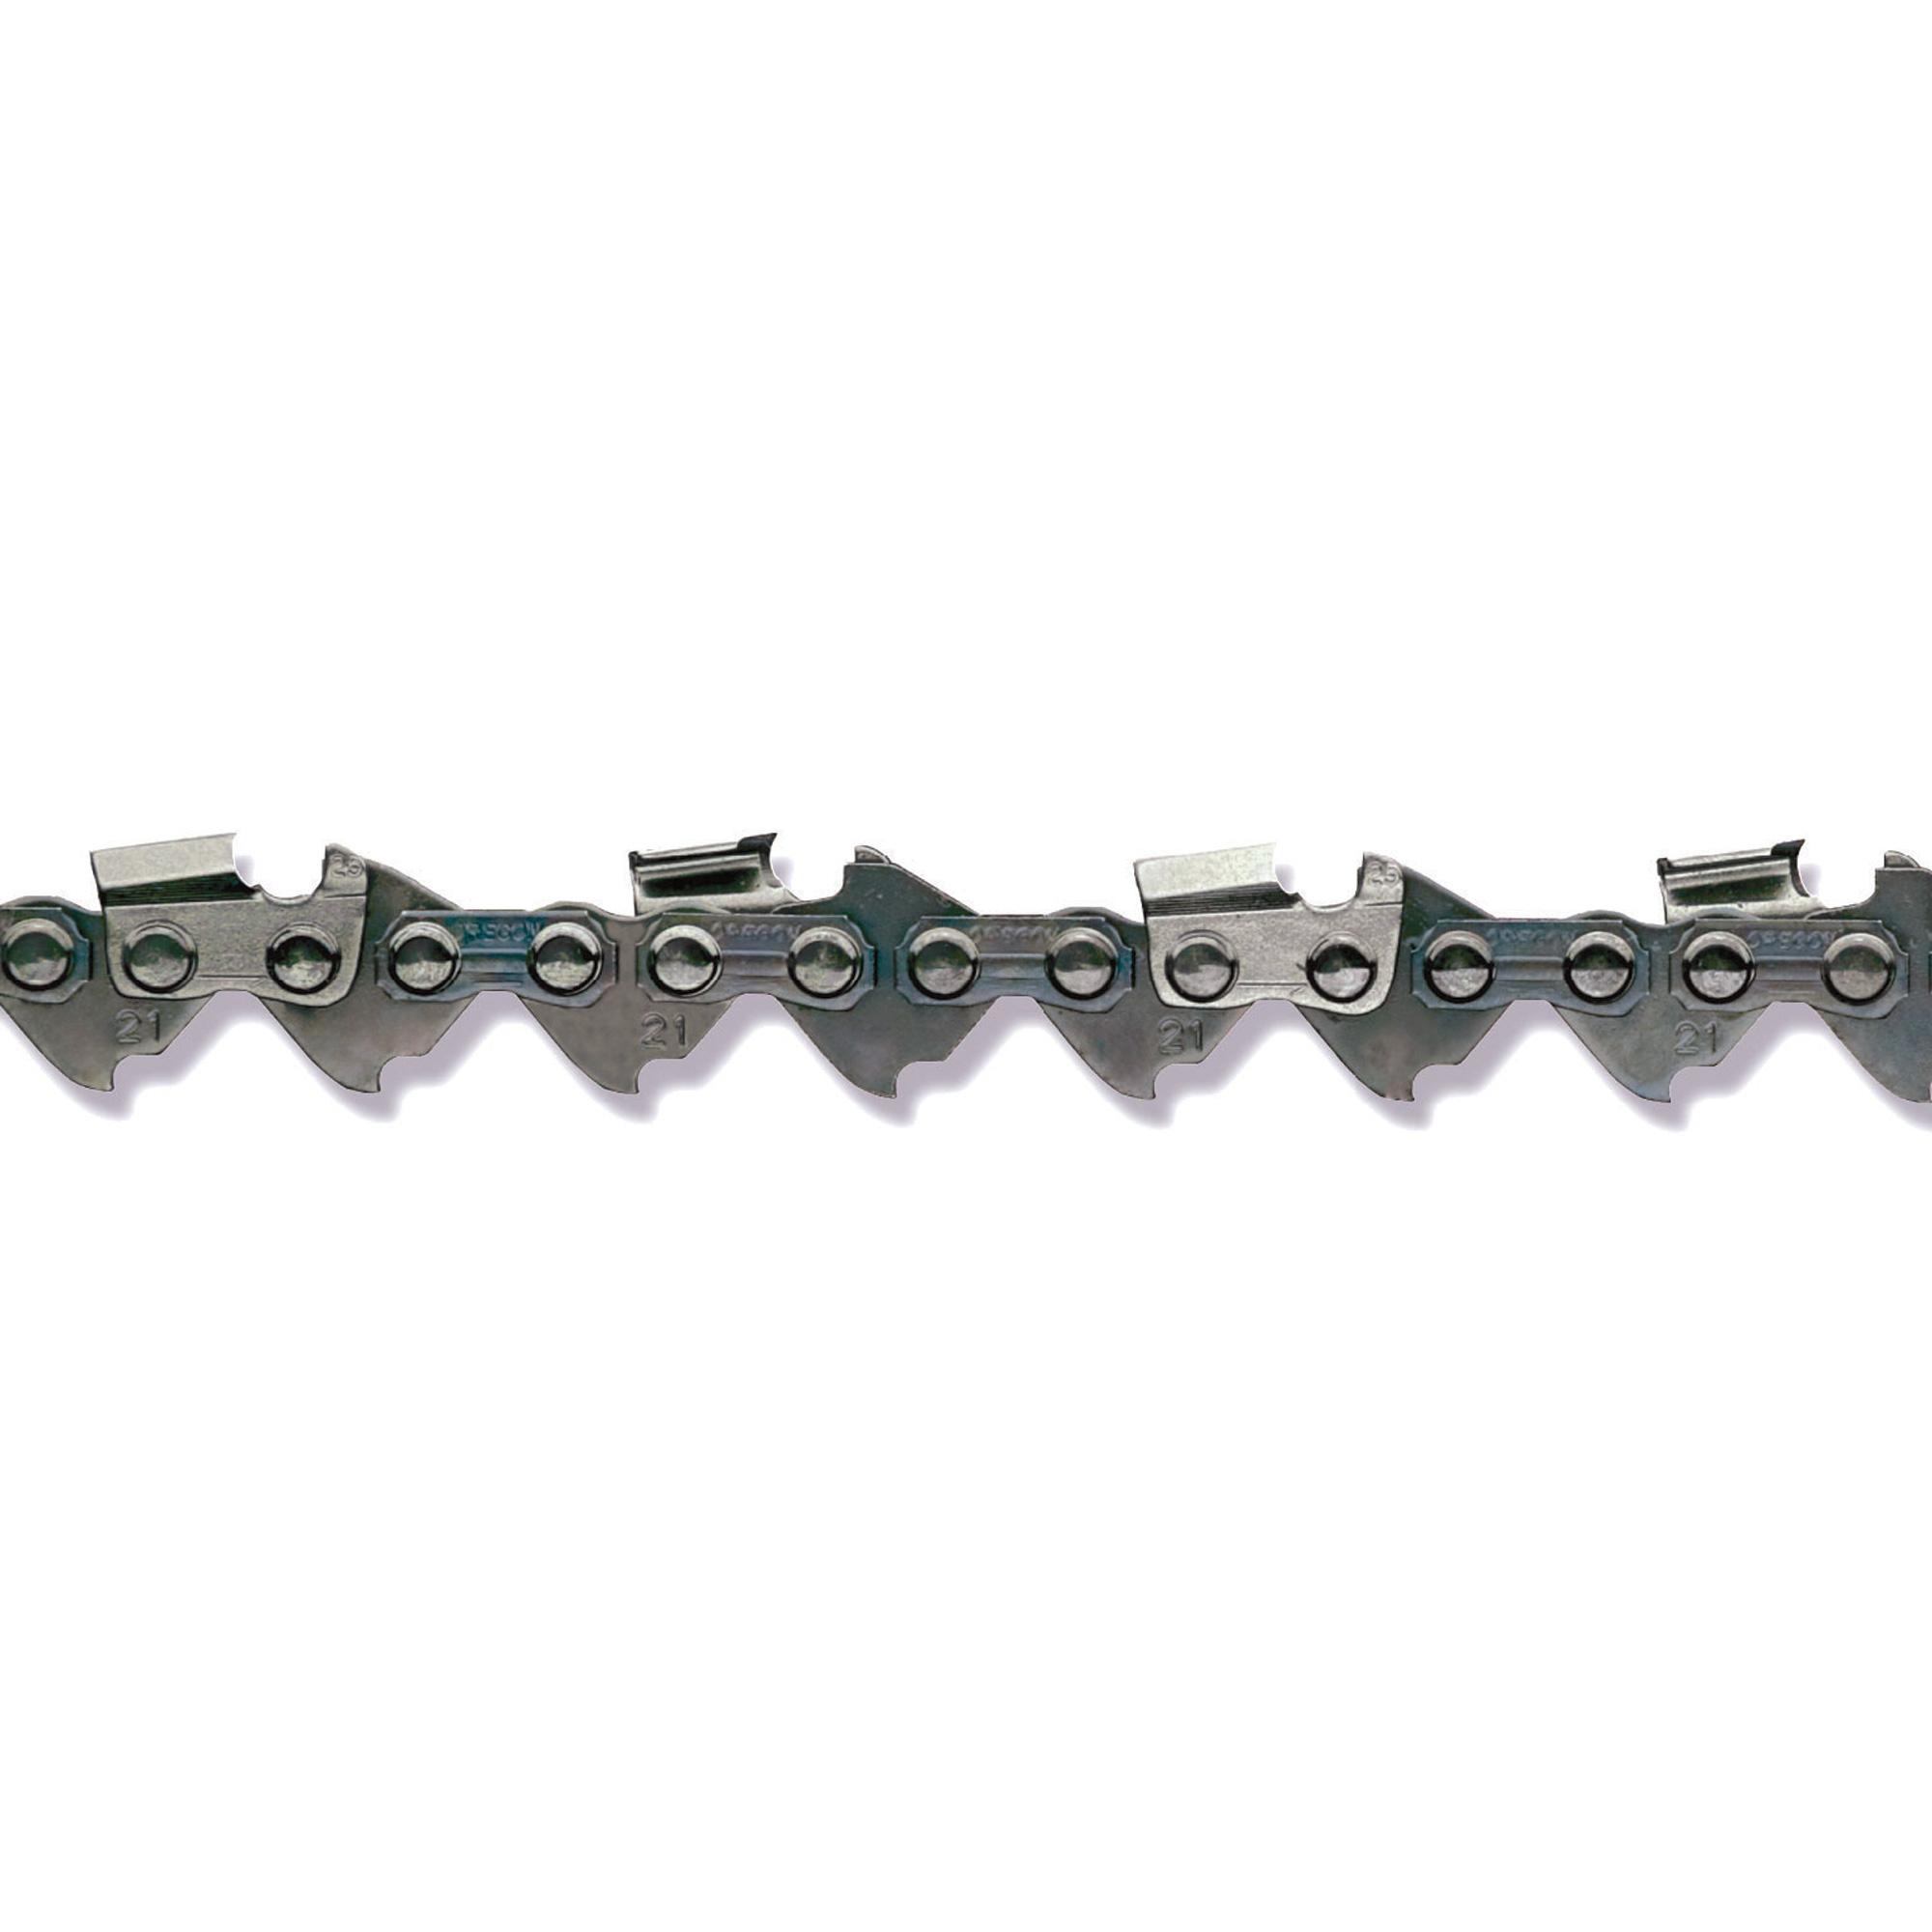 Chain Saw Blades : Chainsaw blade gallery